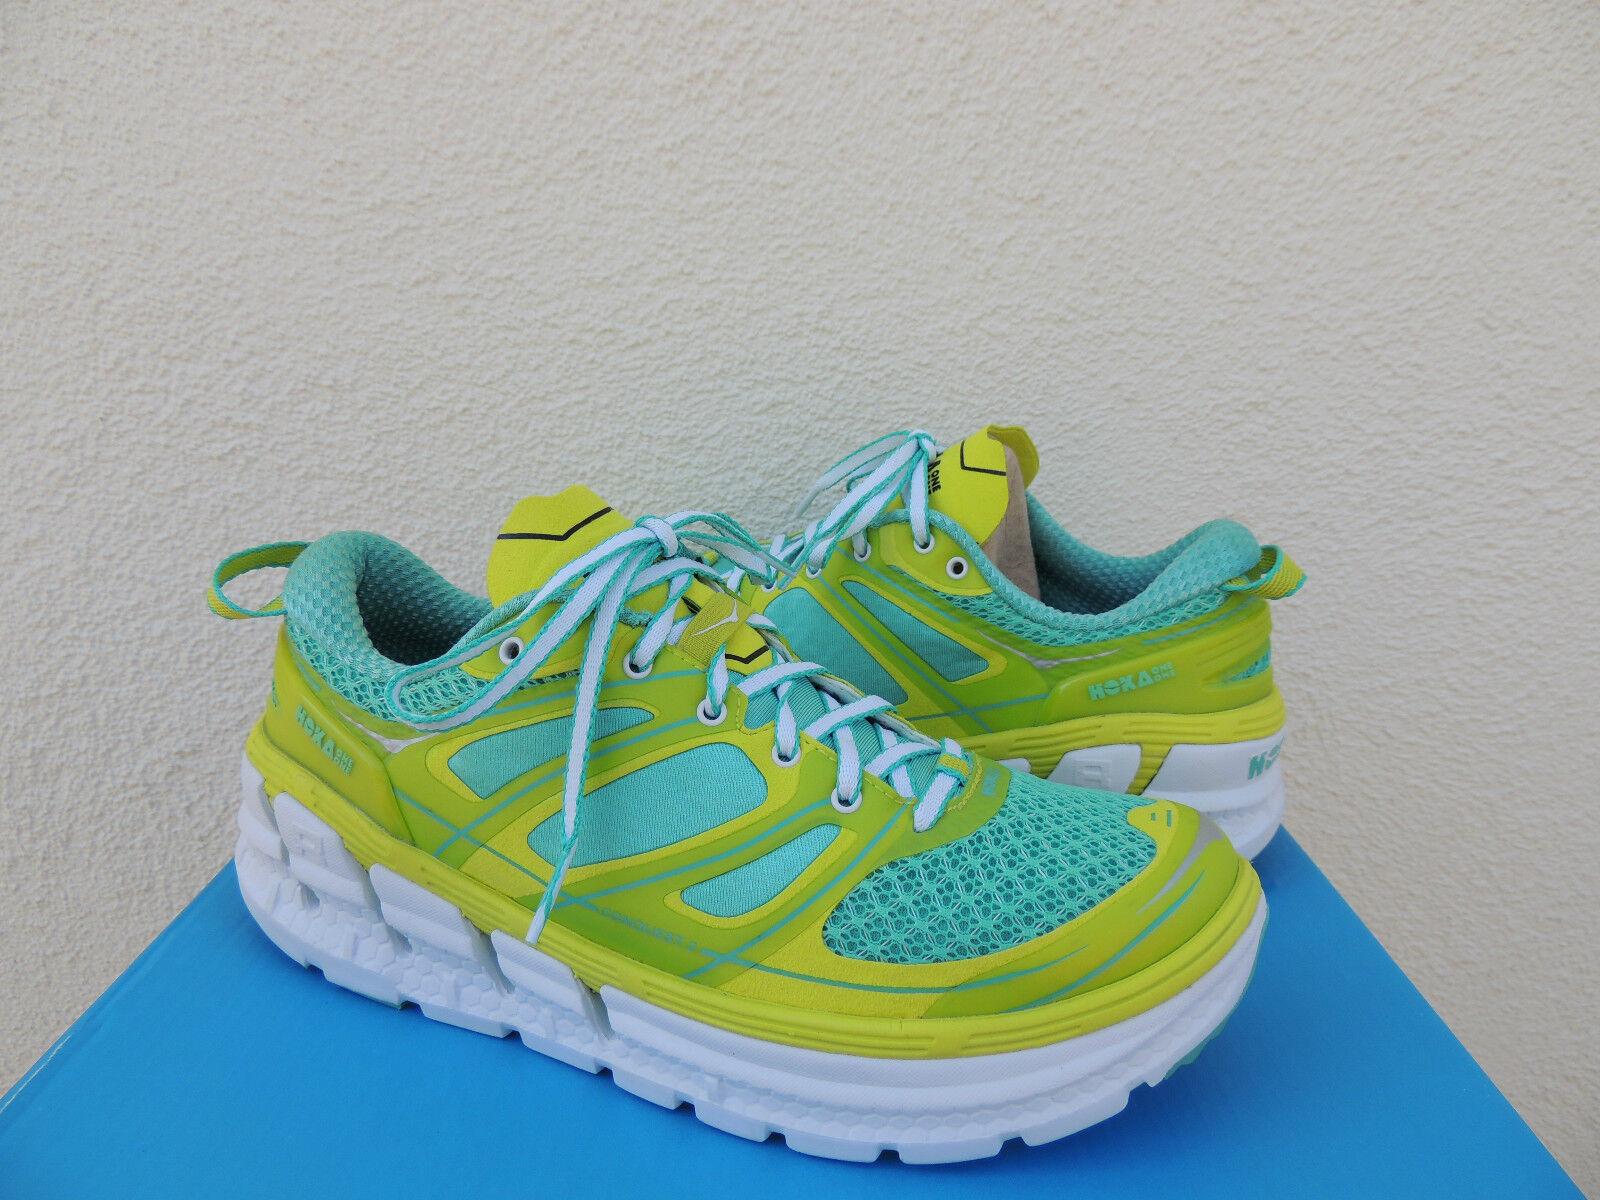 HOKA ONE ONE CONQUEST 2 ACID  WATERFALL RUNNING scarpe, US 10.5  EUR 43 1 3  NEW